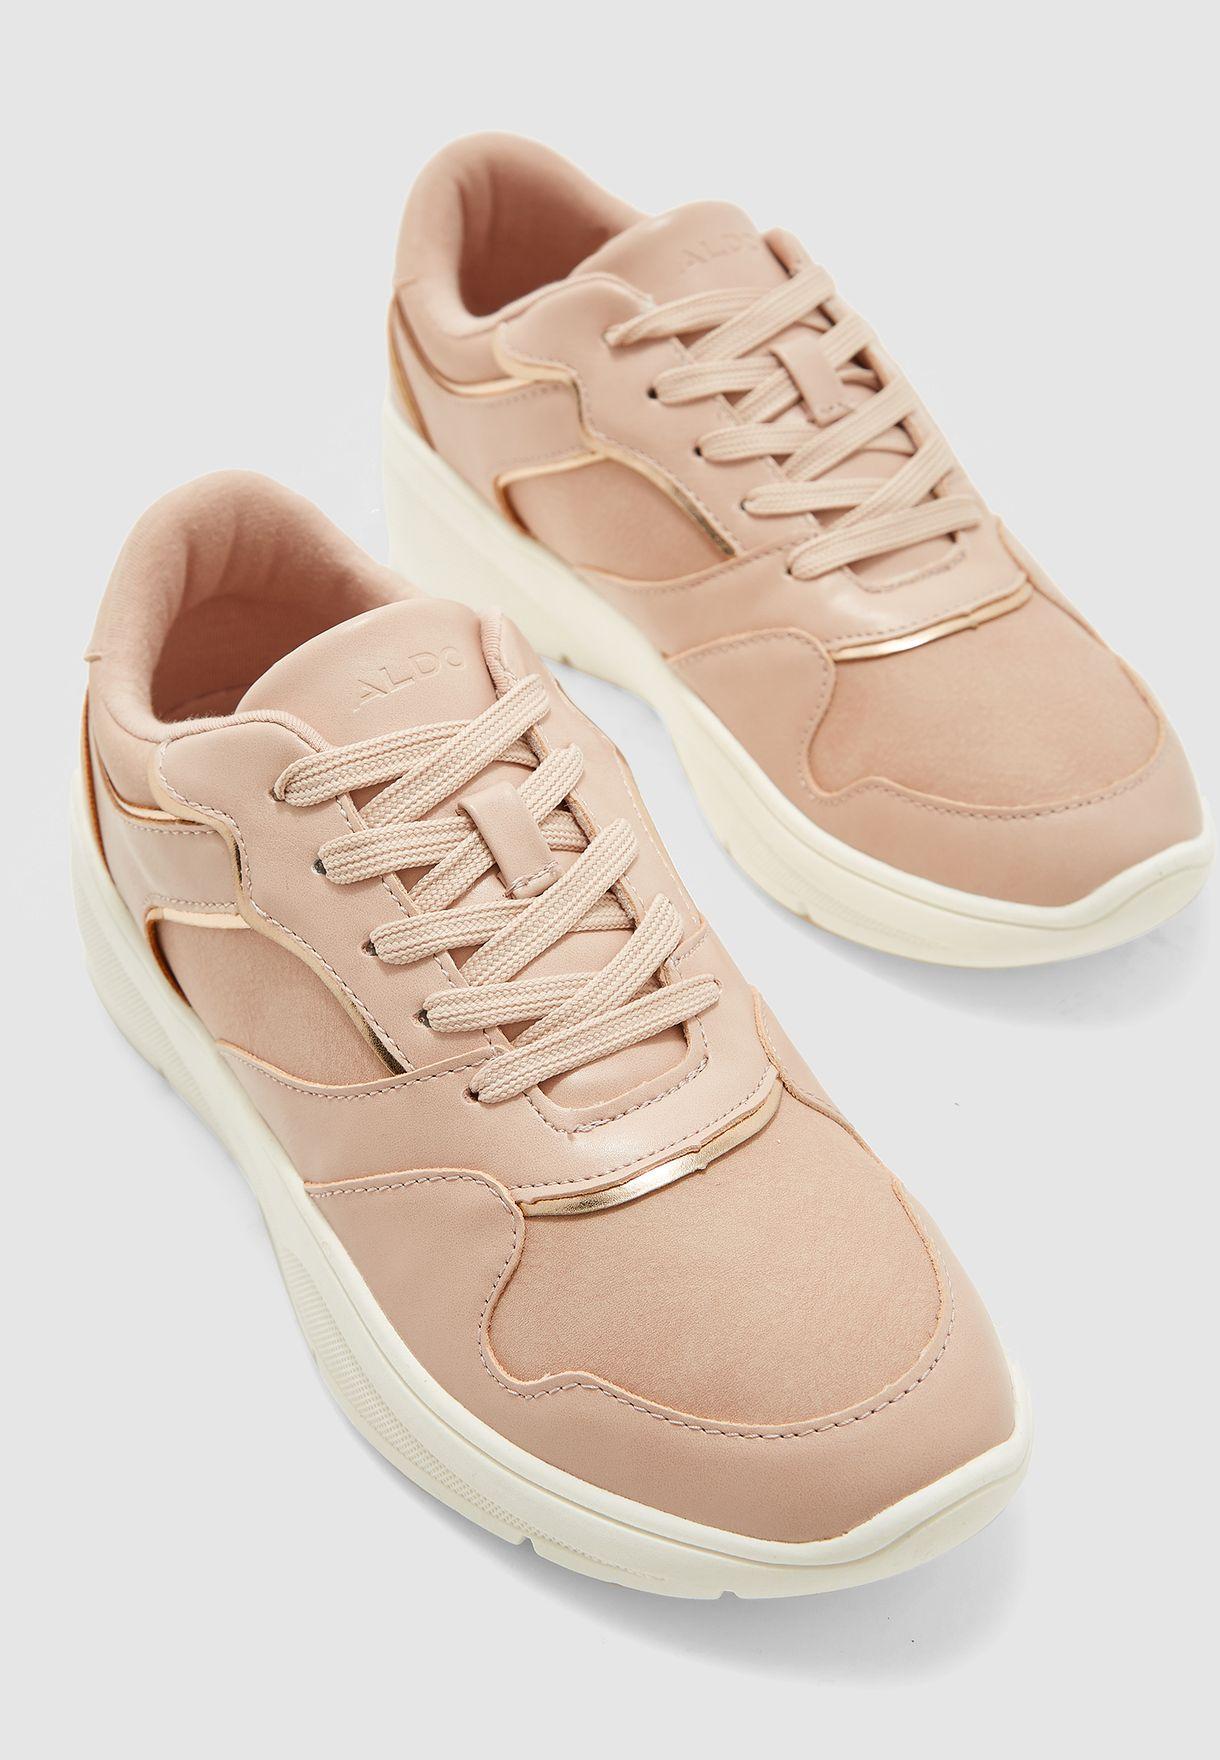 Agrarevia Low Top Sneaker - Pink